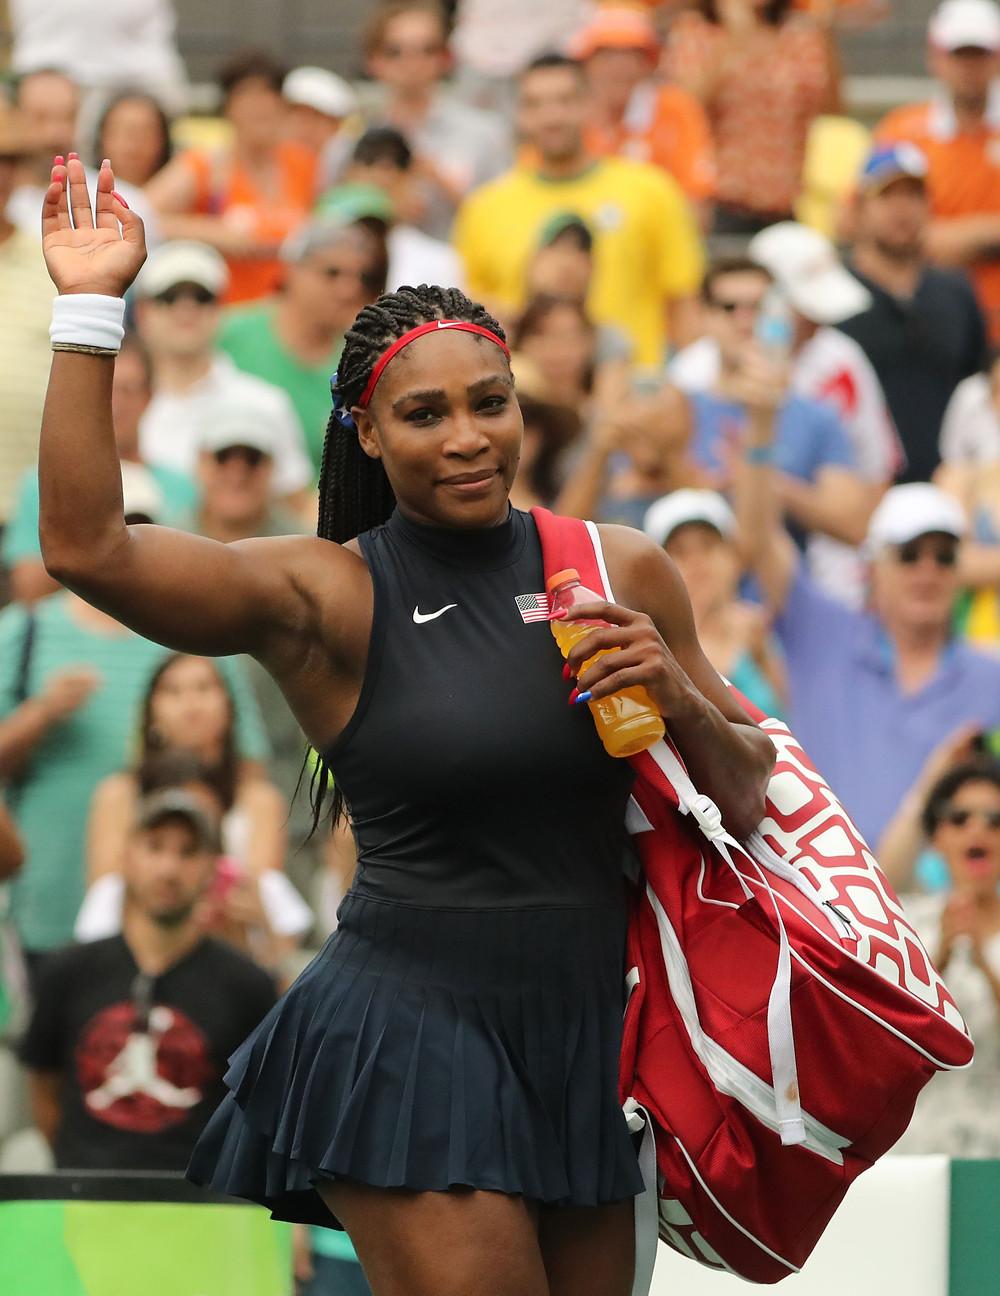 Image of Serena Williams - Copyright : Leonard Zhukovsky